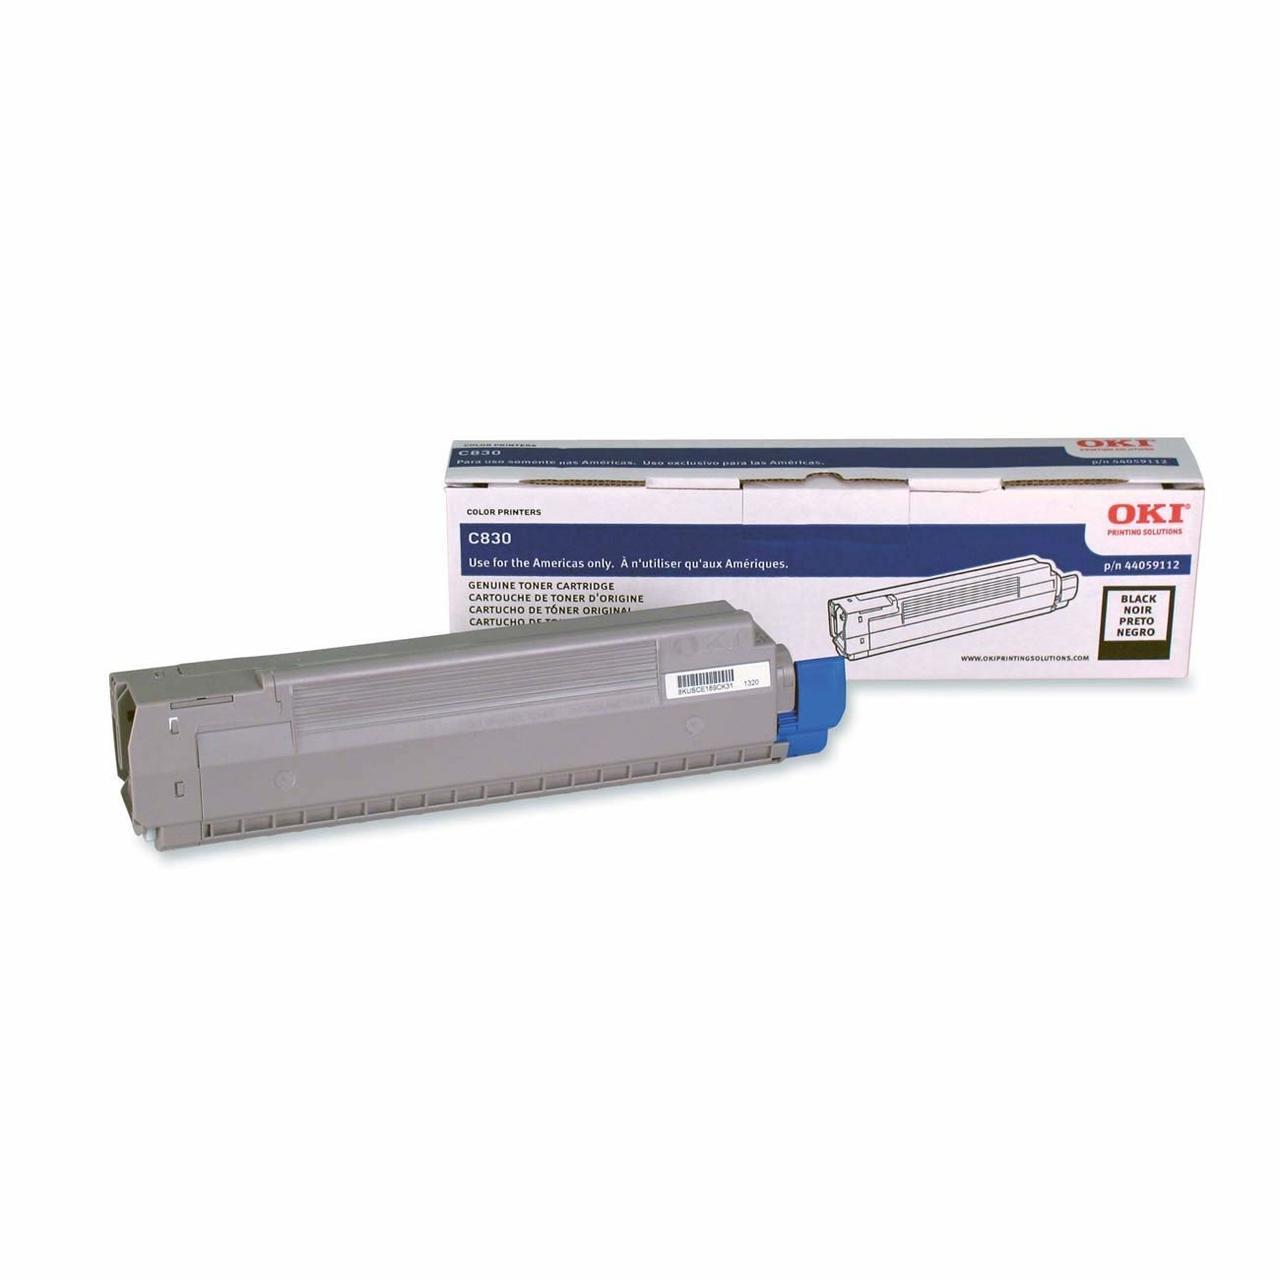 44059112 | Original Okidata C830 Toner Cartridge - Black